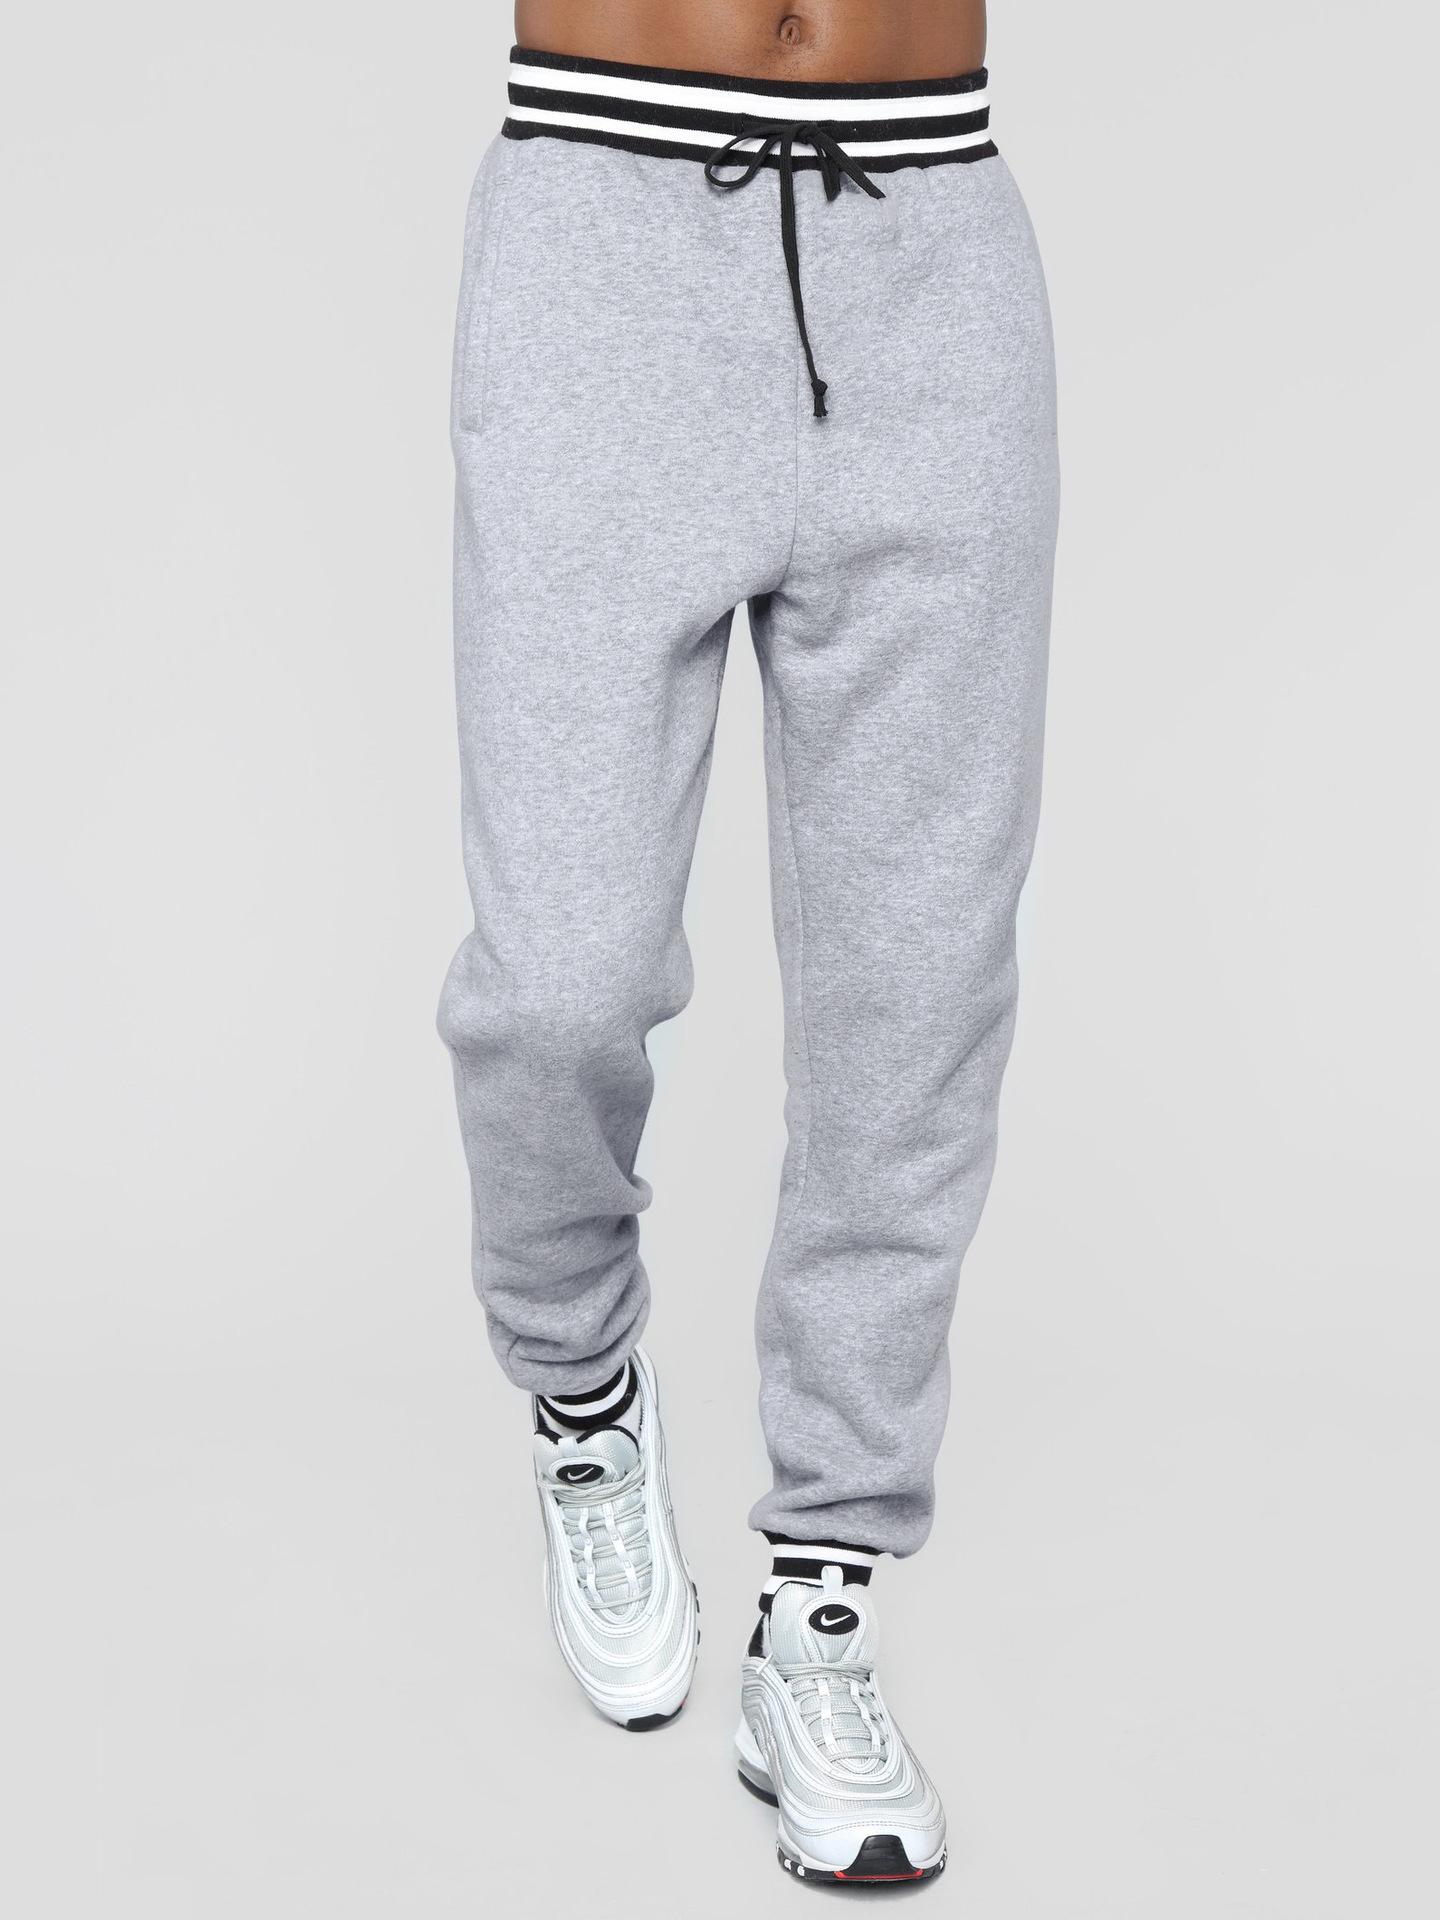 Casual Drawstring Jogger Pants Men